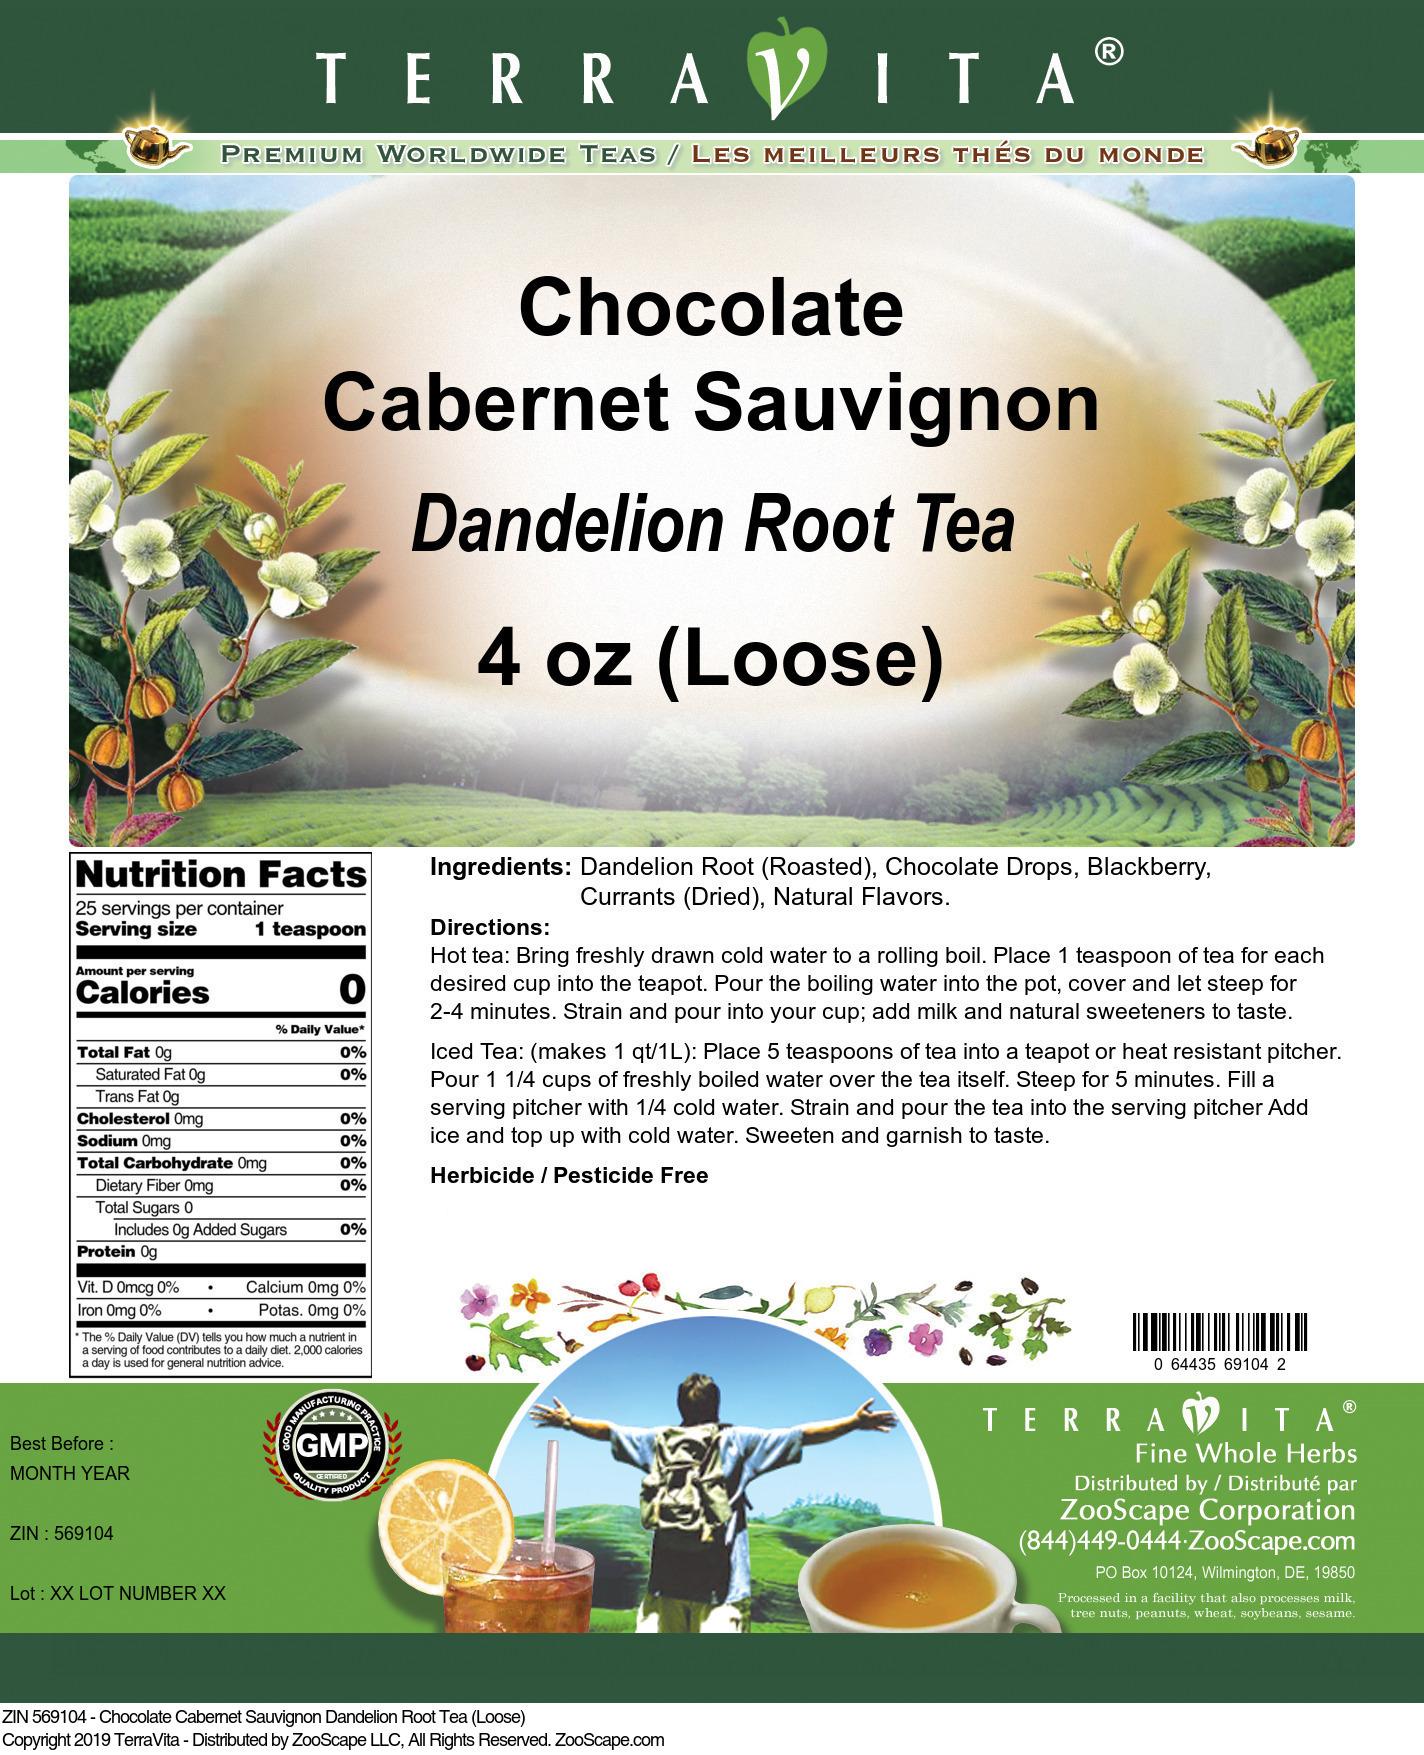 Chocolate Cabernet Sauvignon Dandelion Root Tea (Loose)